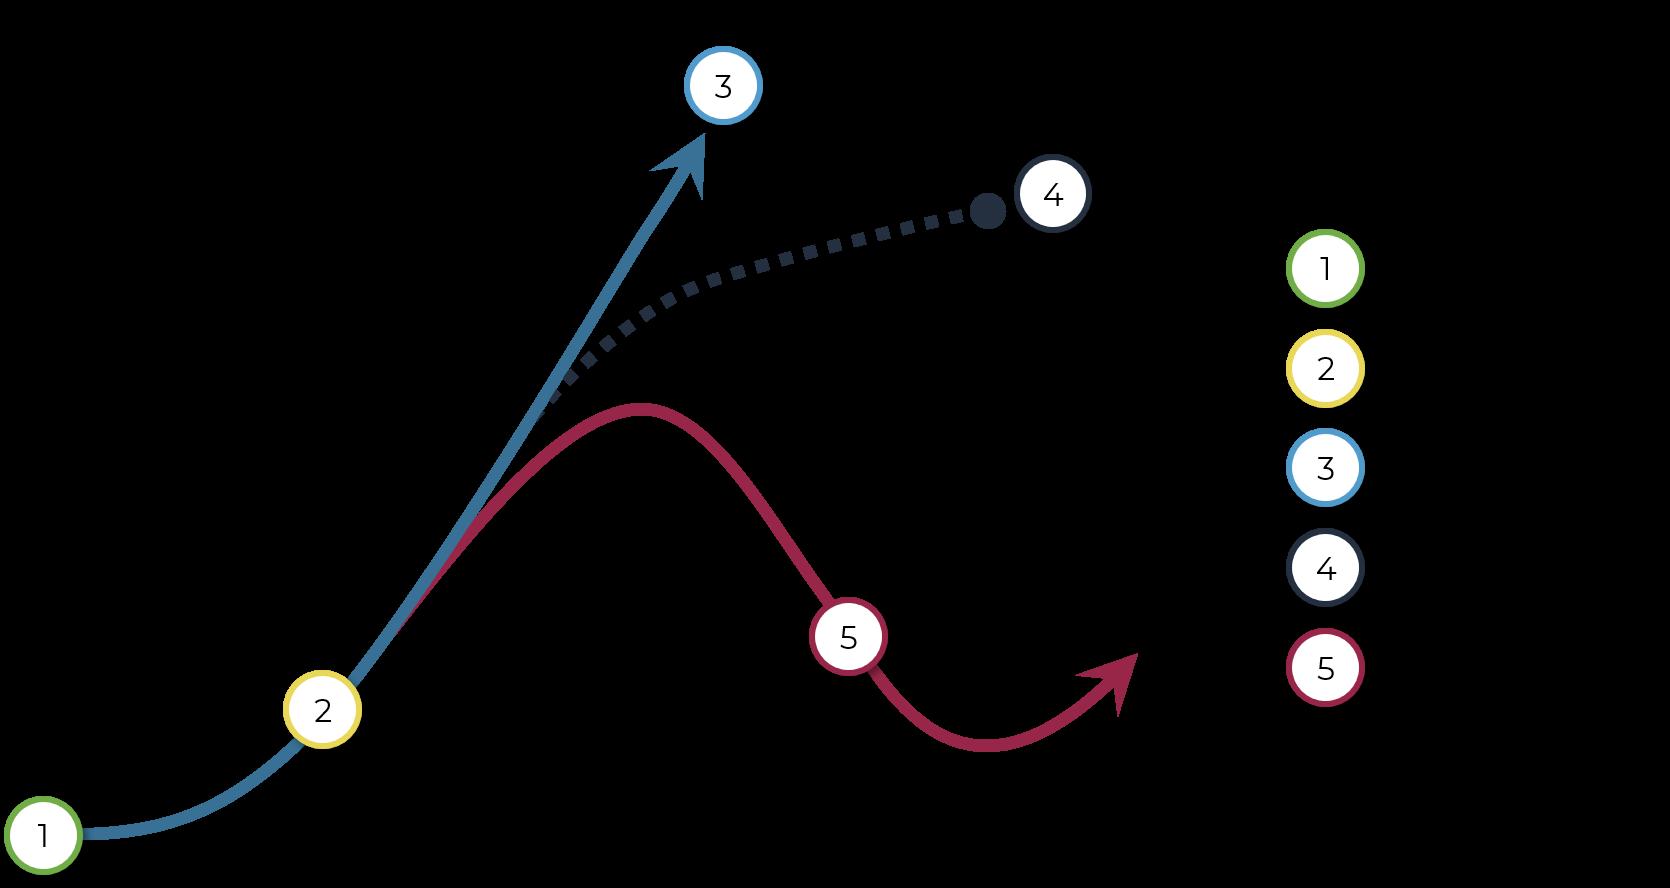 entrepreneu's journey, the company lifecycle